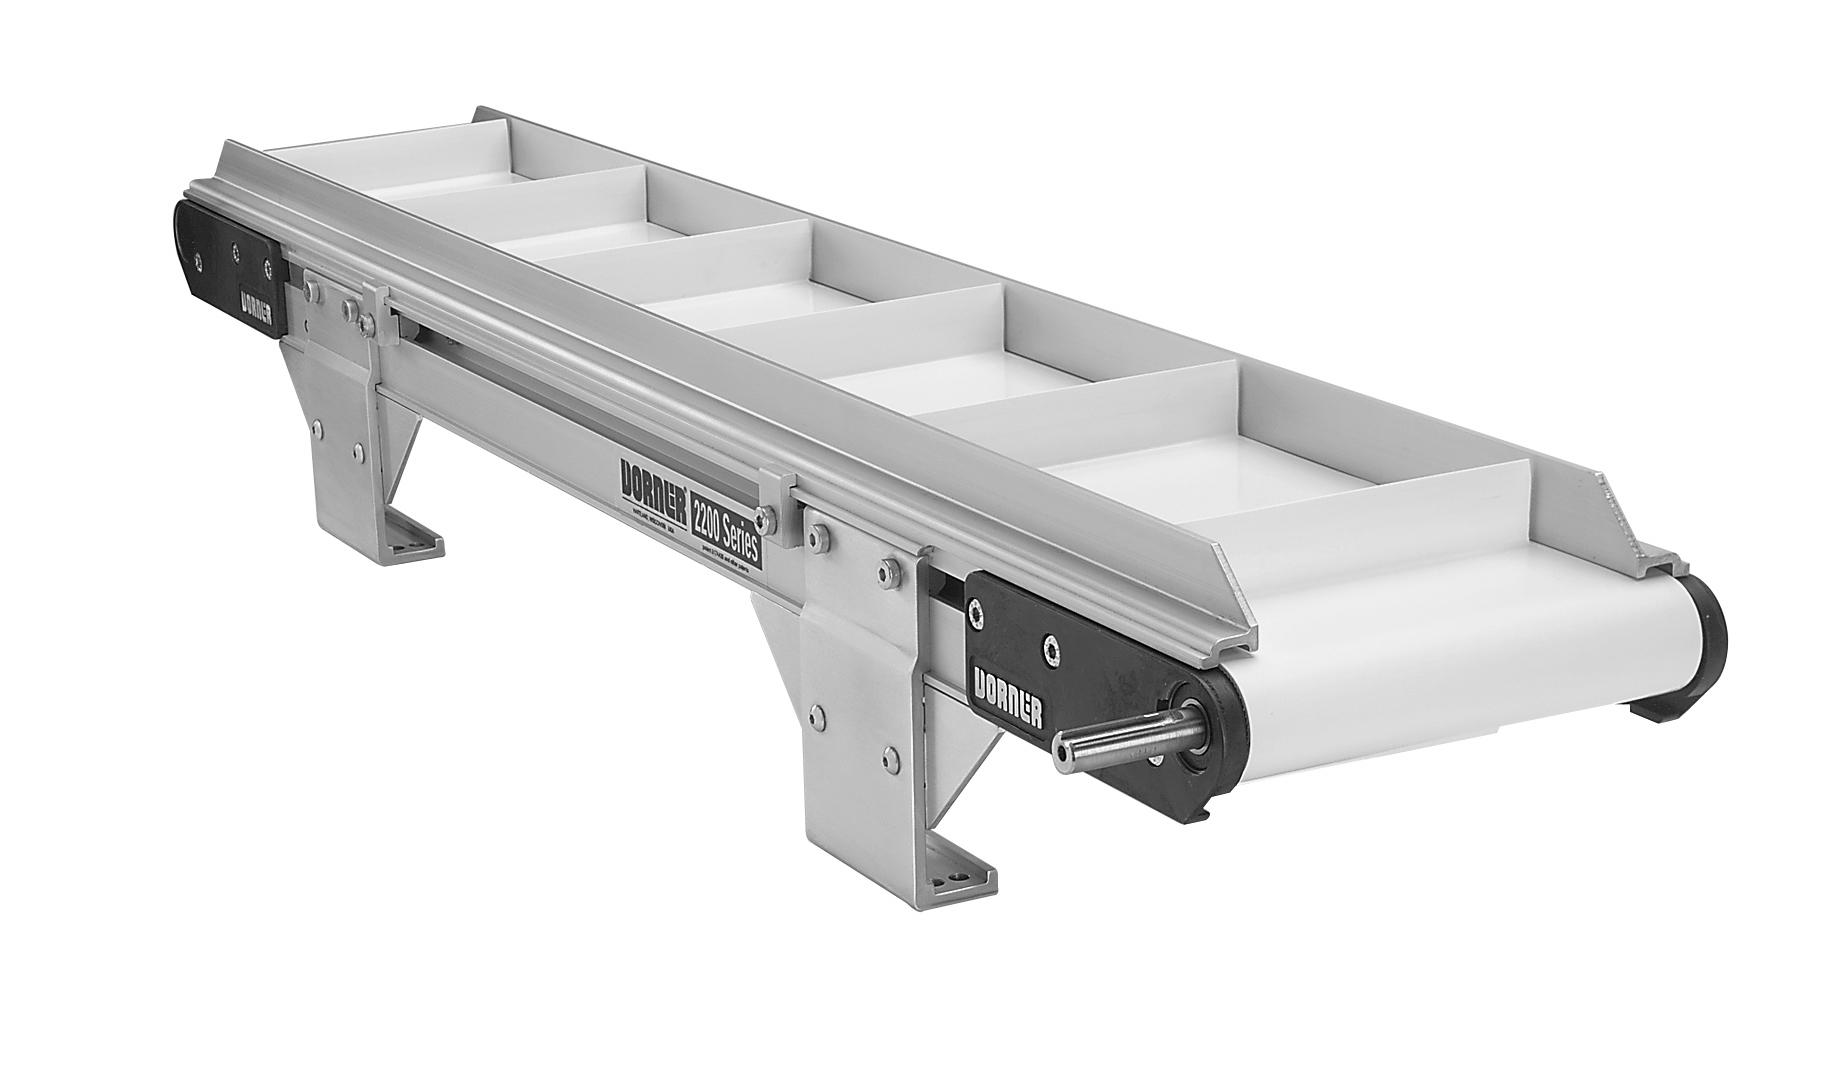 low profile belt conveyors low profile conveyor belts uk manufacture design of industrial. Black Bedroom Furniture Sets. Home Design Ideas